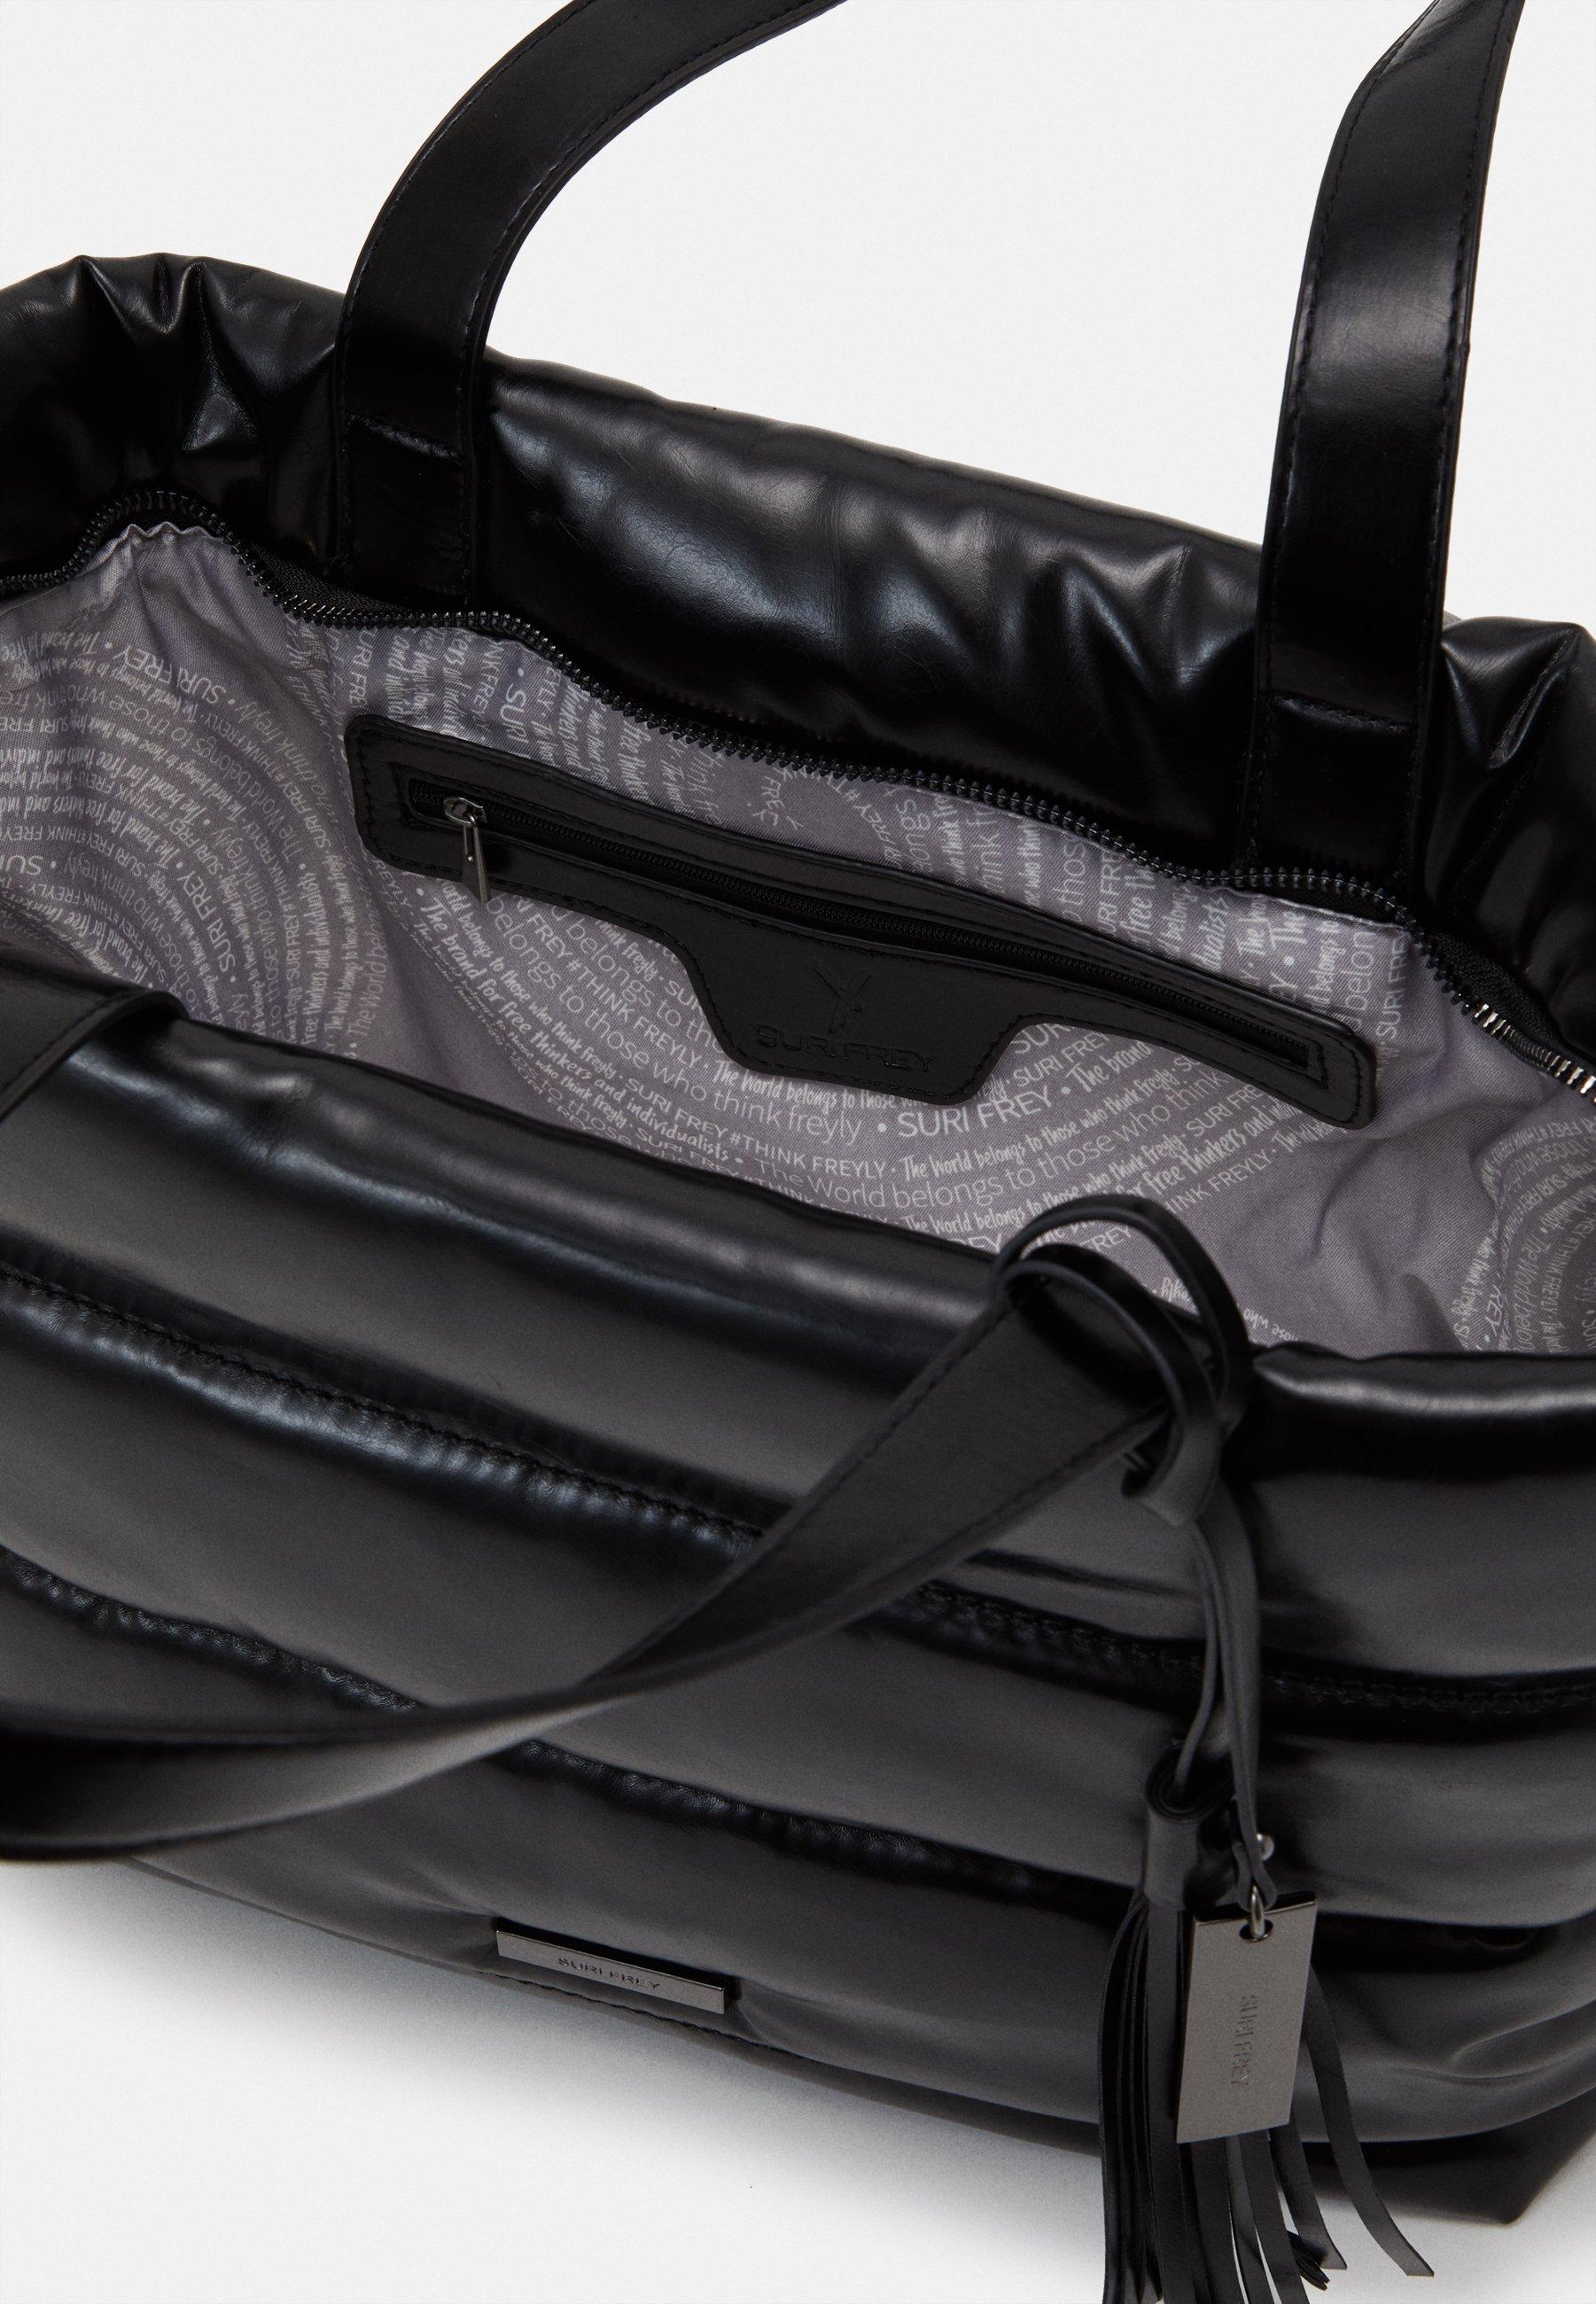 Suri Frey Label Shelley - Shopping Bag Black/schwarz